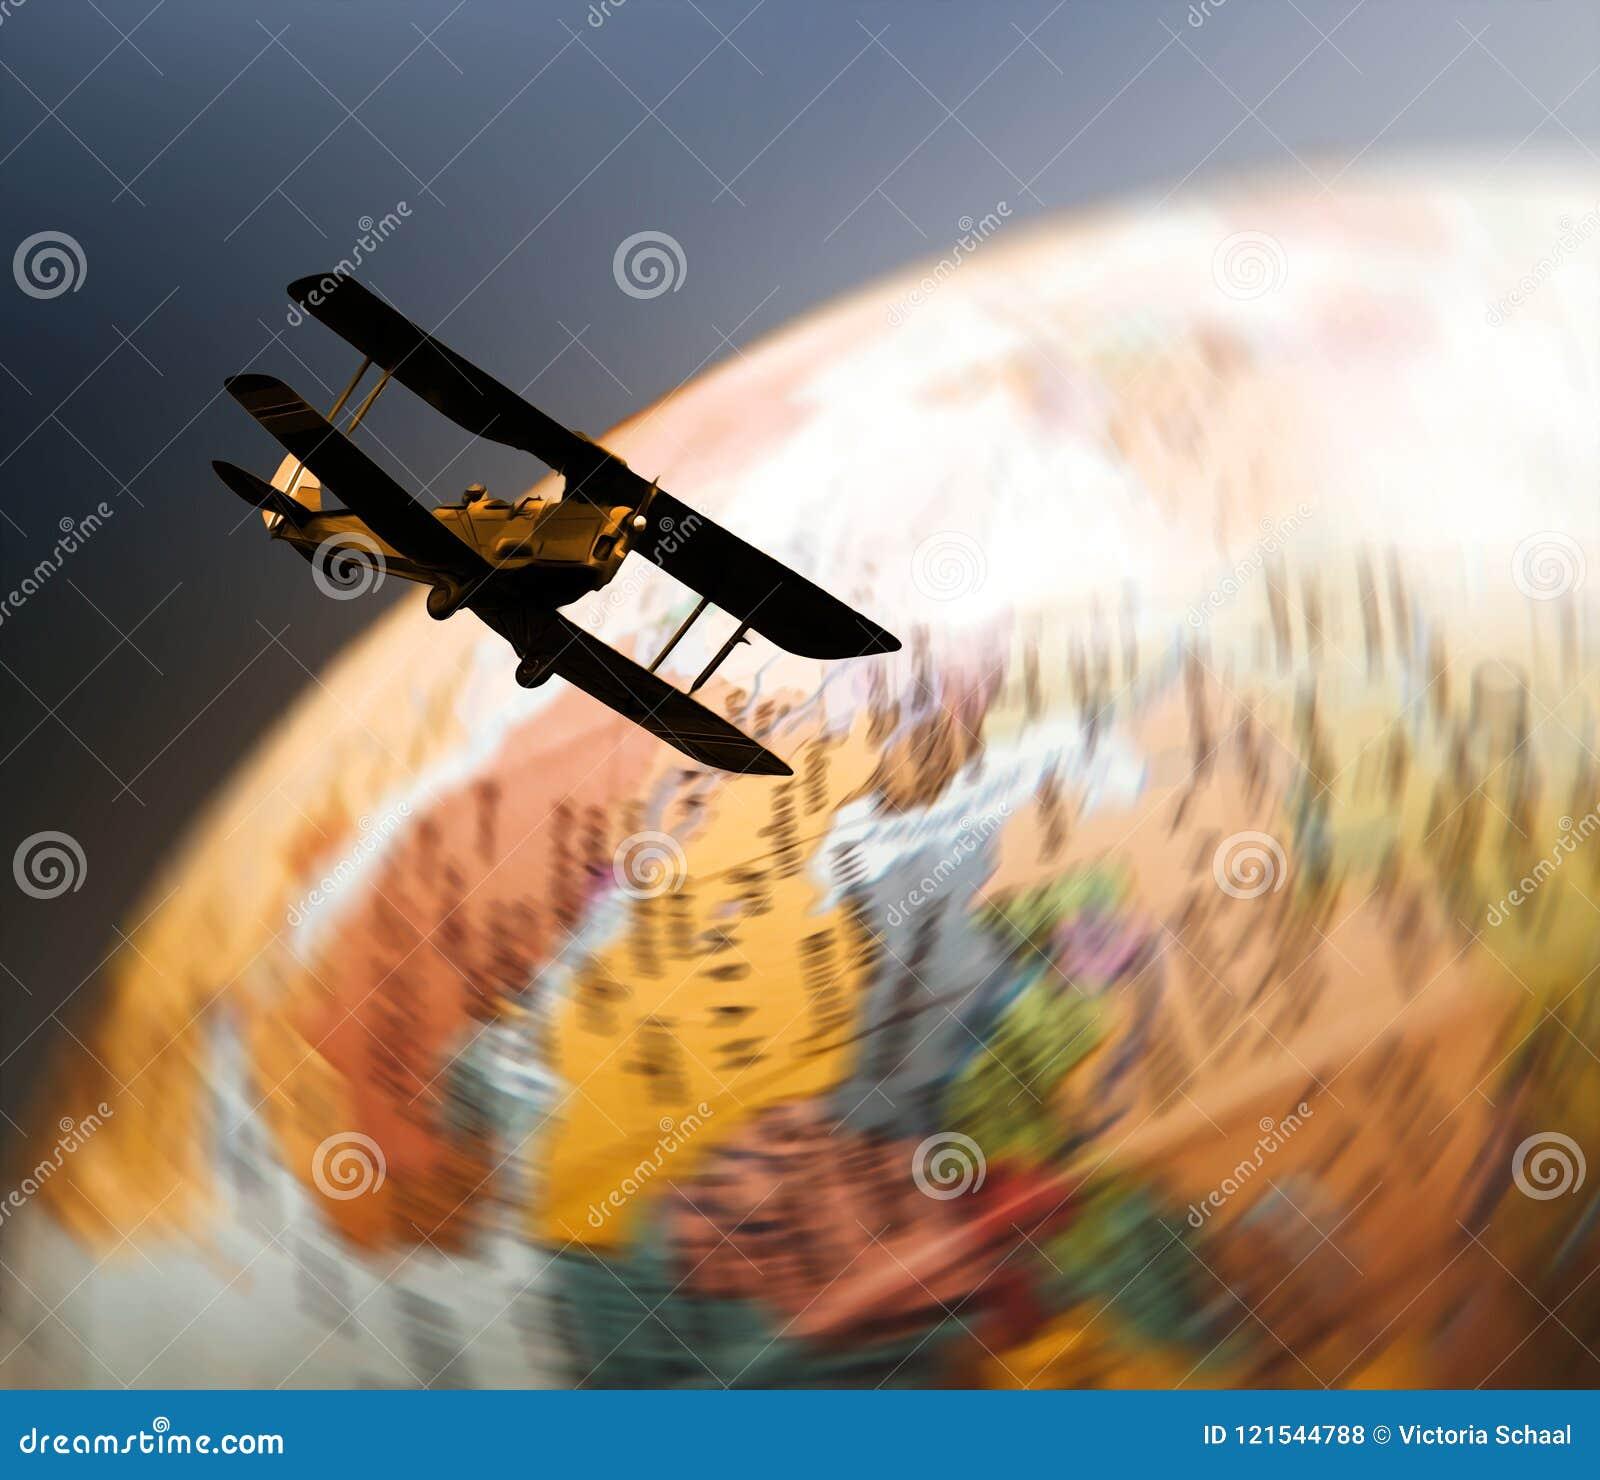 Retro biplane flying over spinning globe